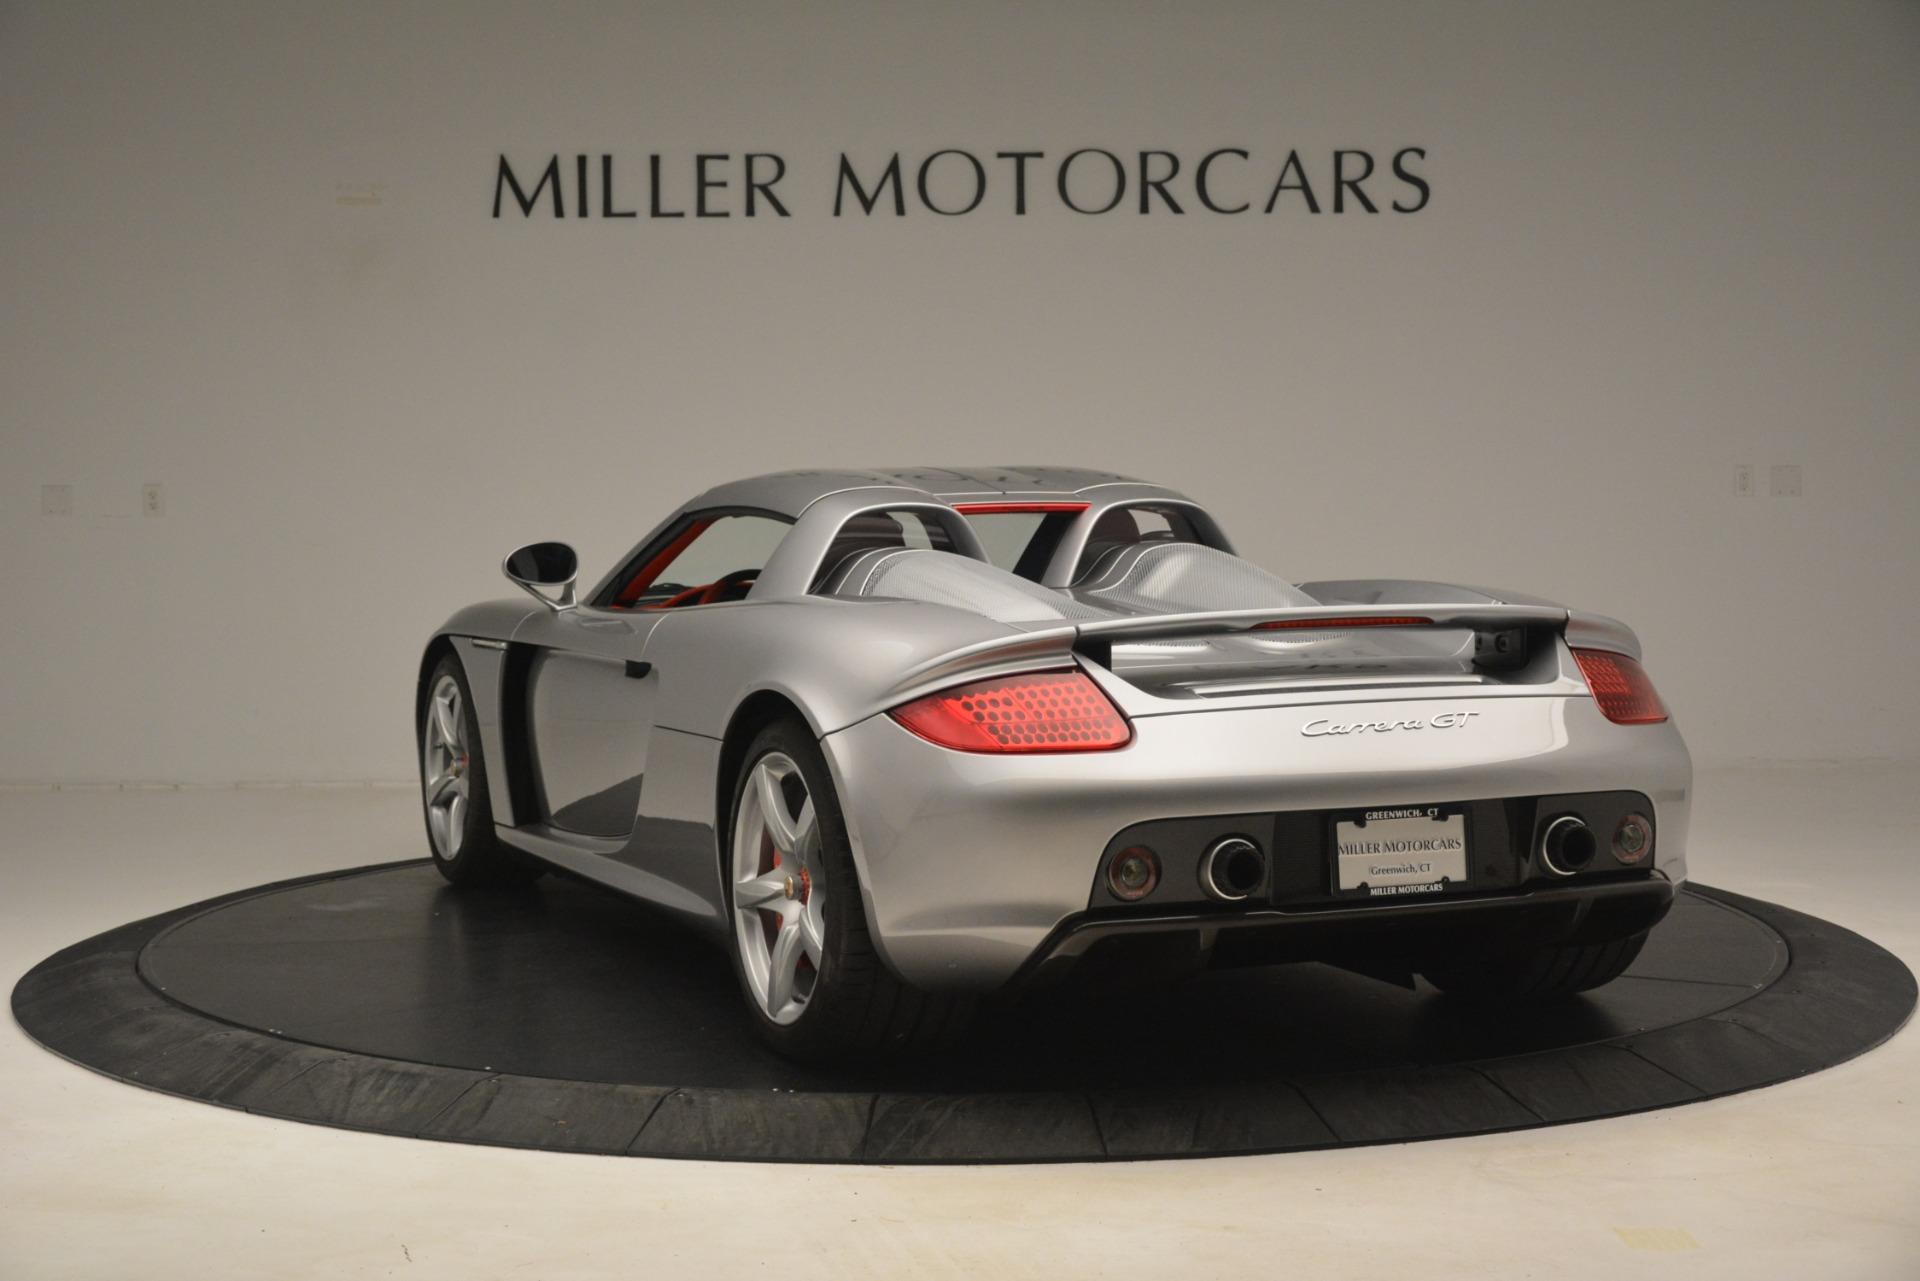 Used 2005 Porsche Carrera GT  For Sale In Greenwich, CT 3161_p17